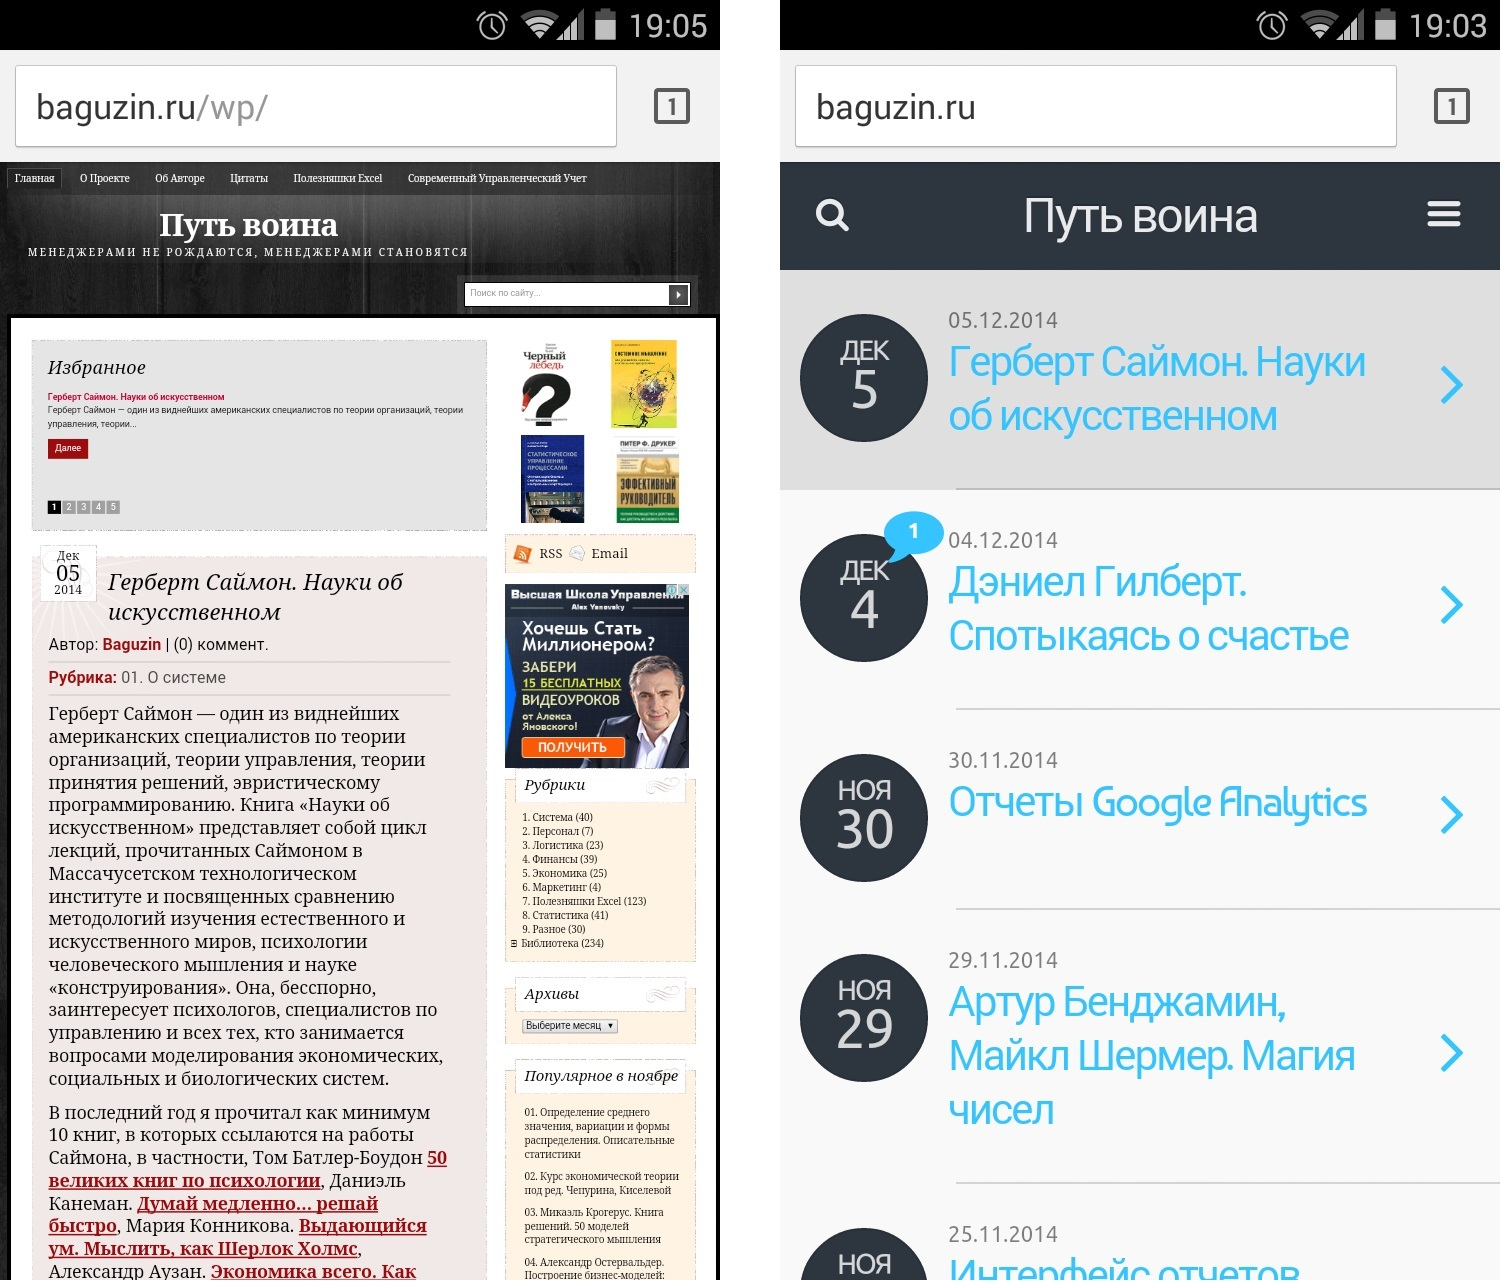 Рис. 6.9. Стандартная (слева) и мобильная версия сайта baguzin.ru